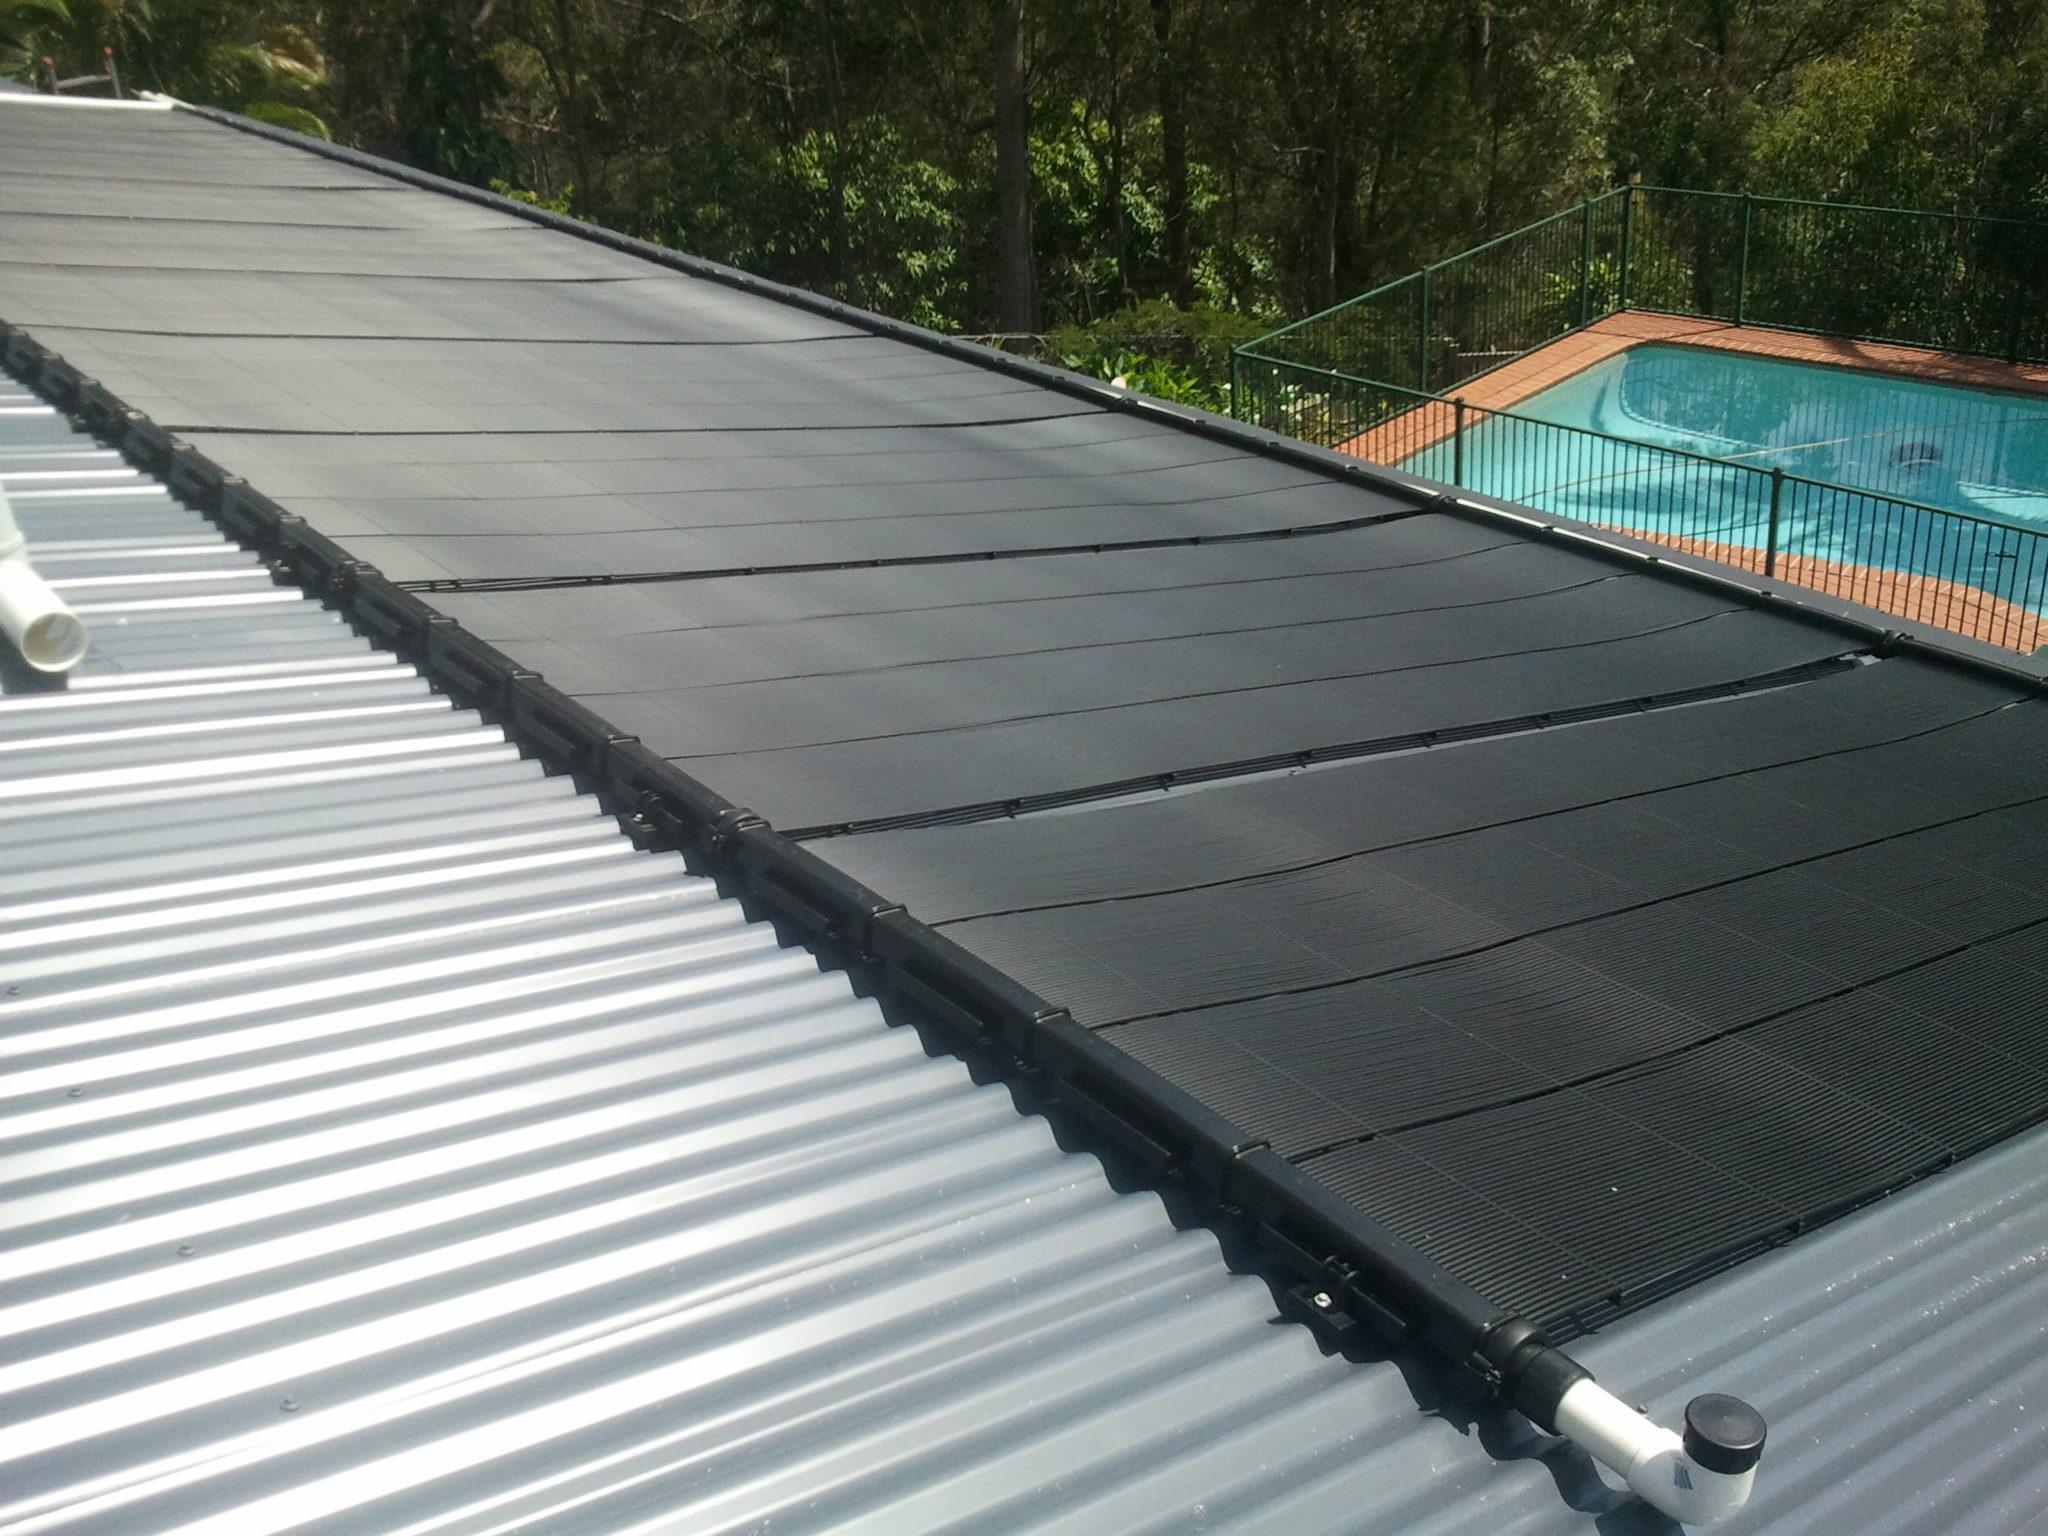 Solar pool heating panels ridgid